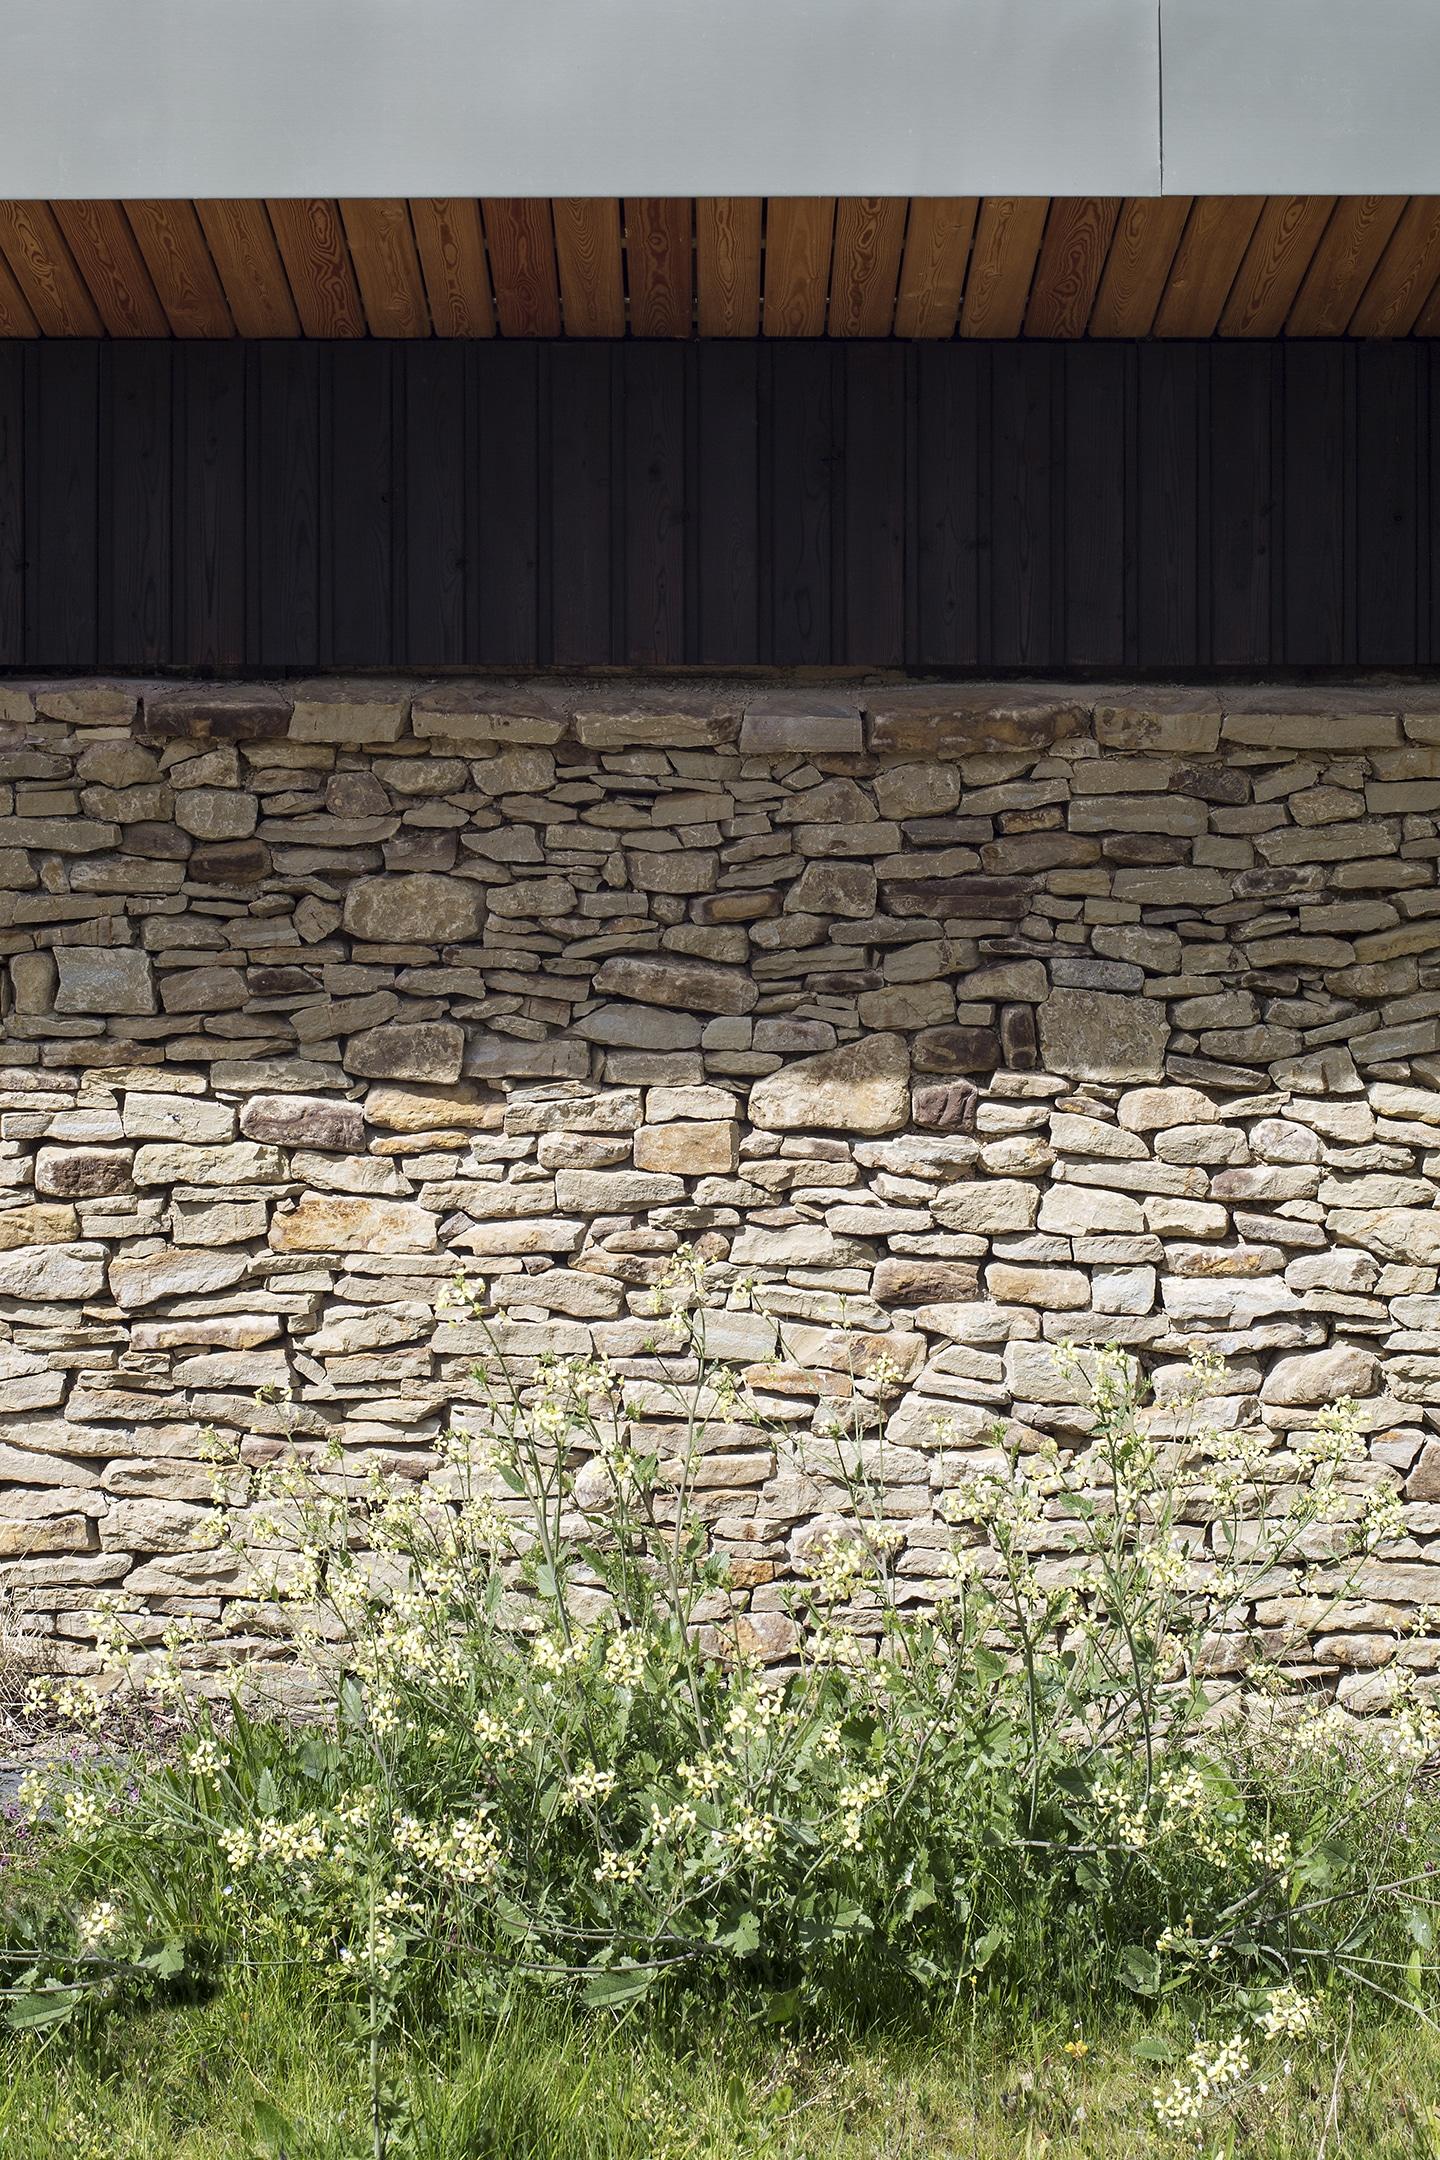 Koshikijima shou sugi ban cladding close up next to natural stone cladding